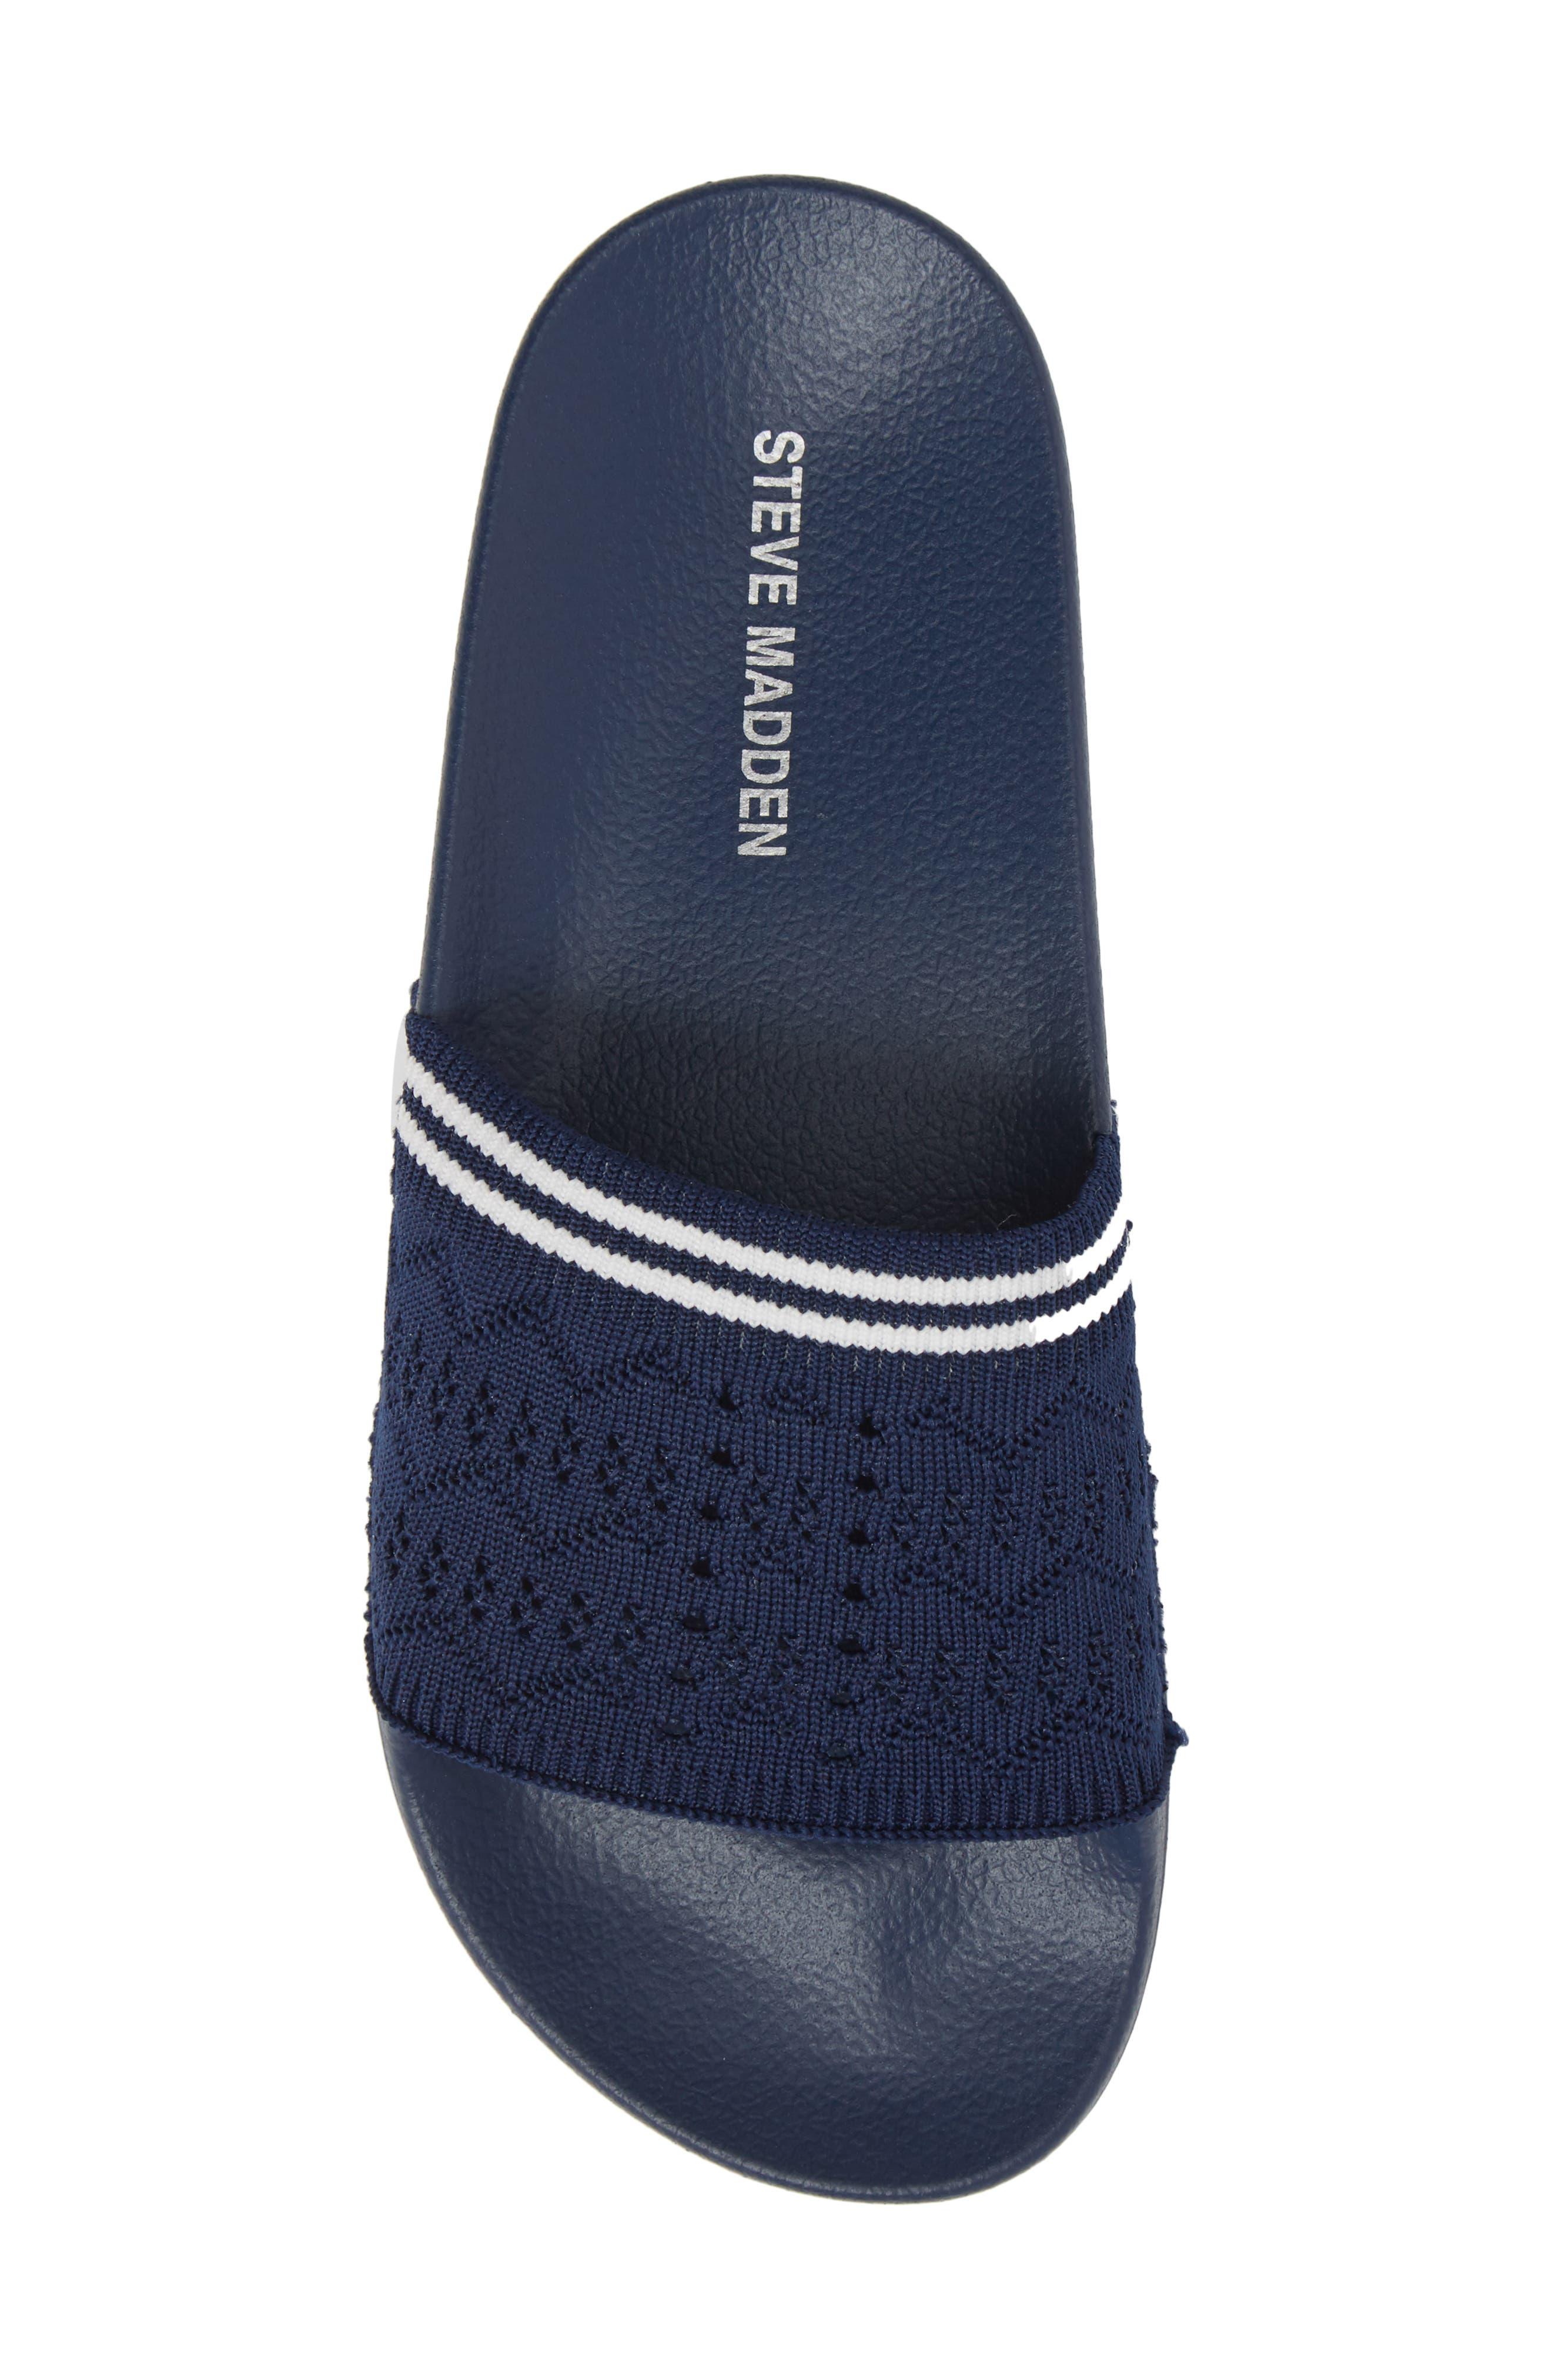 Vibe Sock Knit Slide Sandal,                             Alternate thumbnail 23, color,